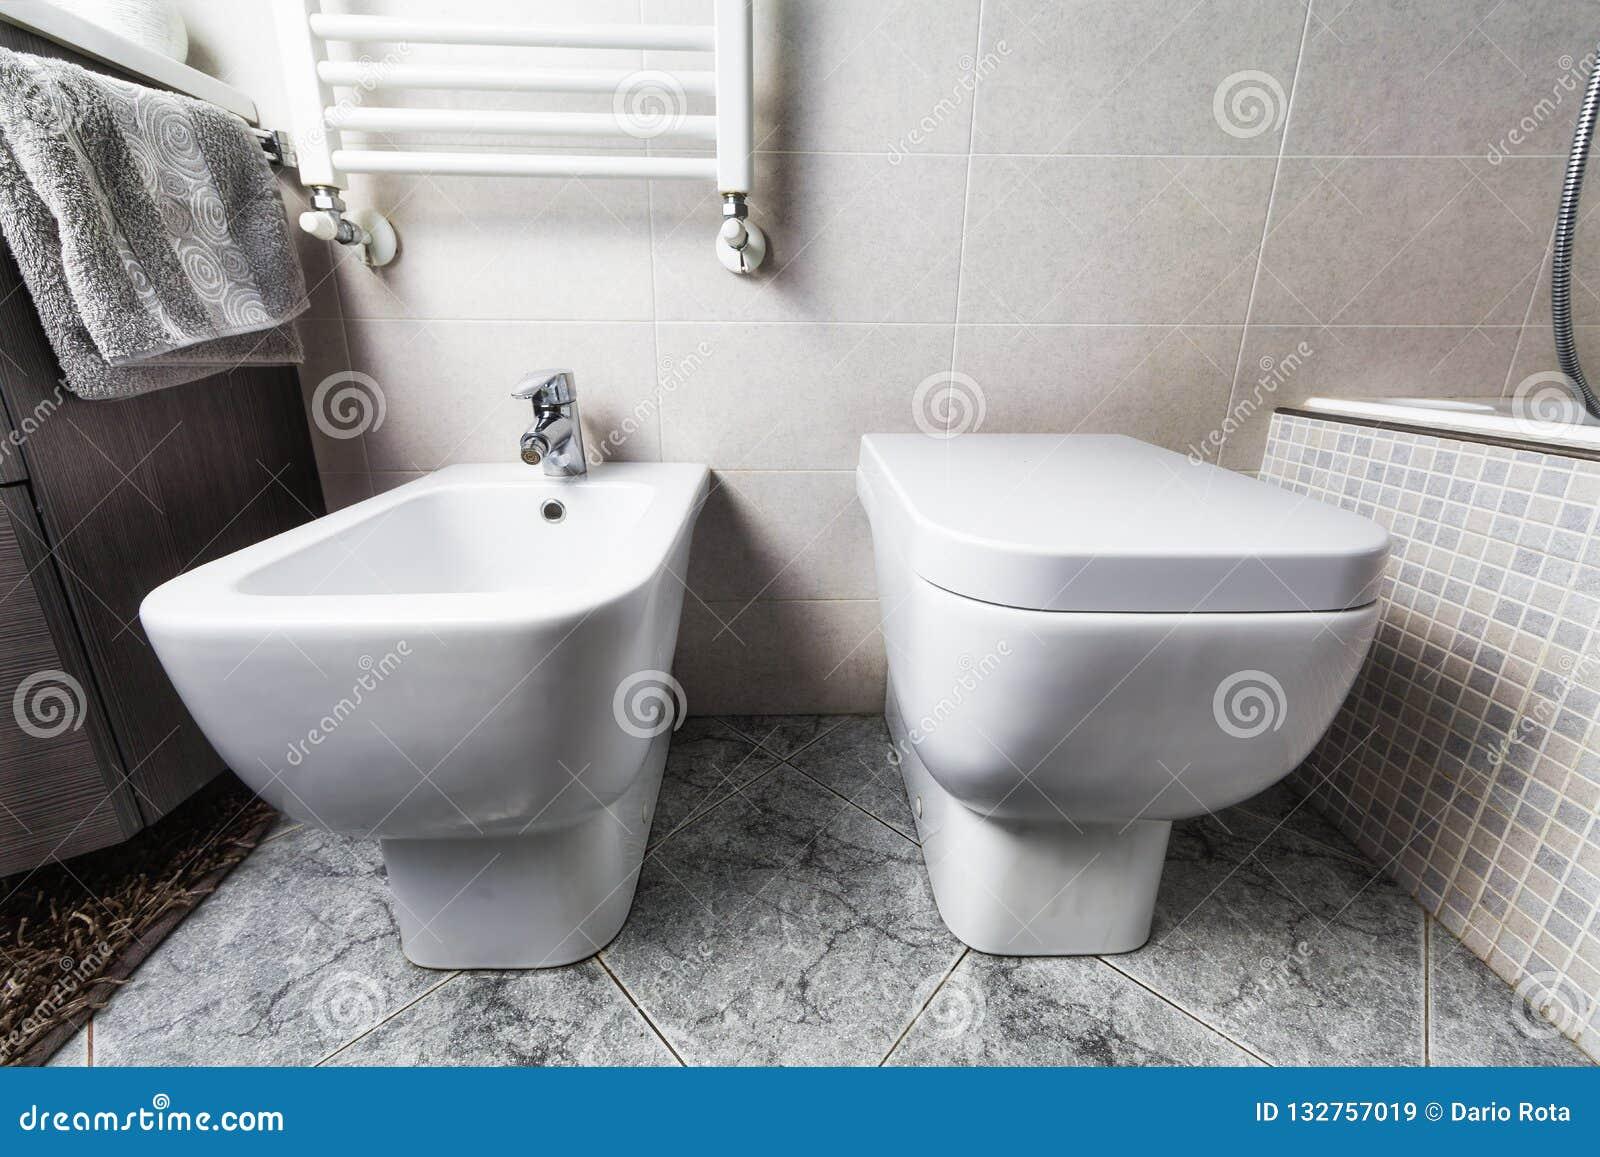 Toilette e calefator do bidê